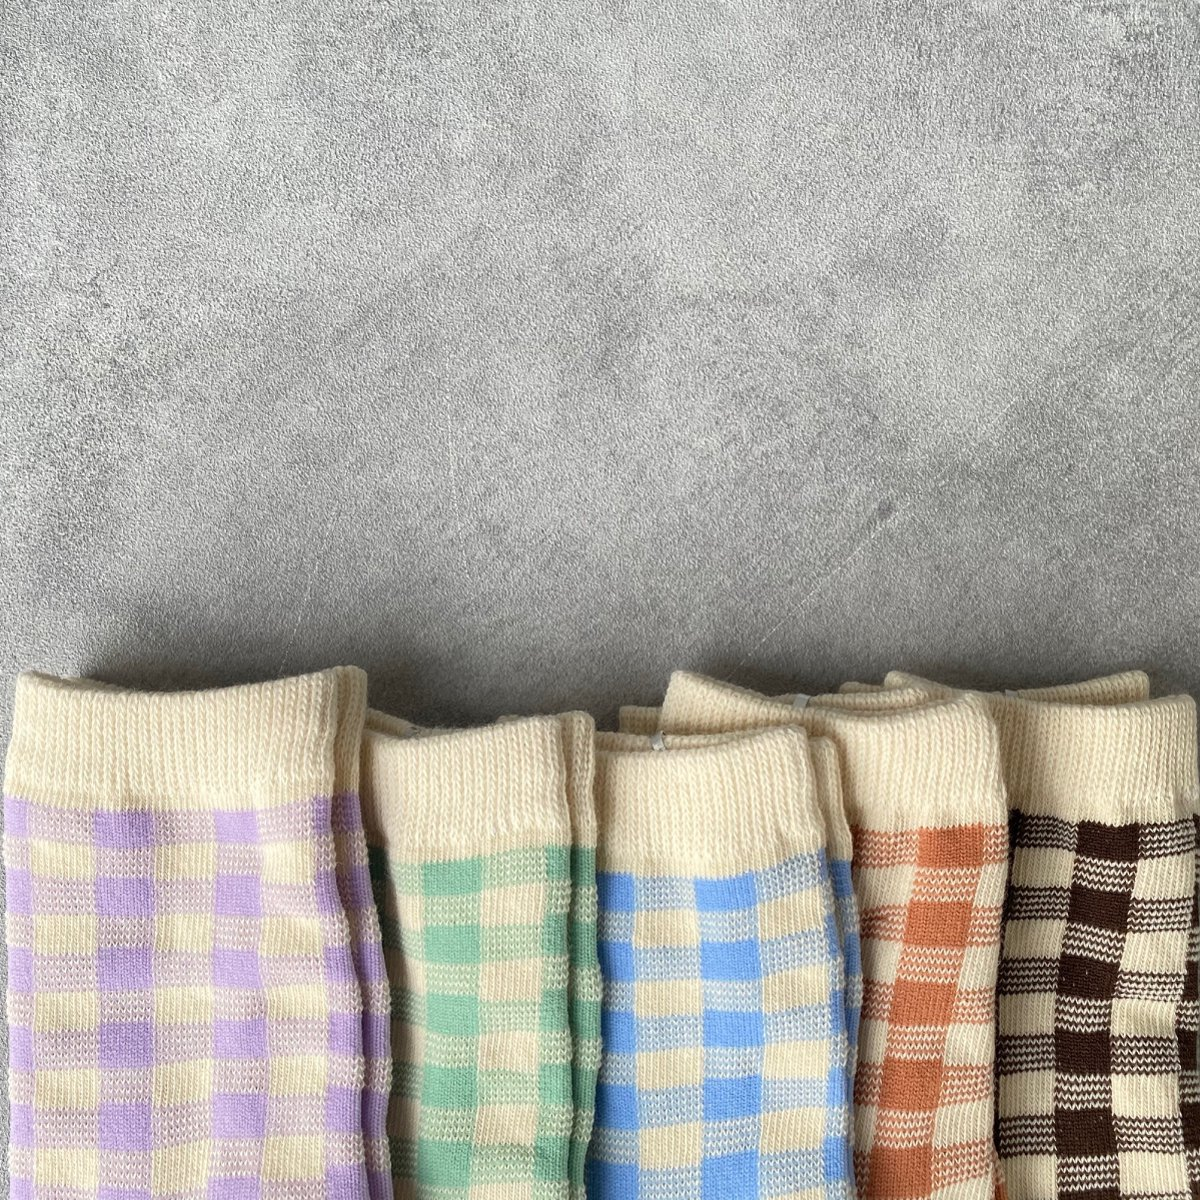 【KIDS】Natural Check Socks 詳細画像6